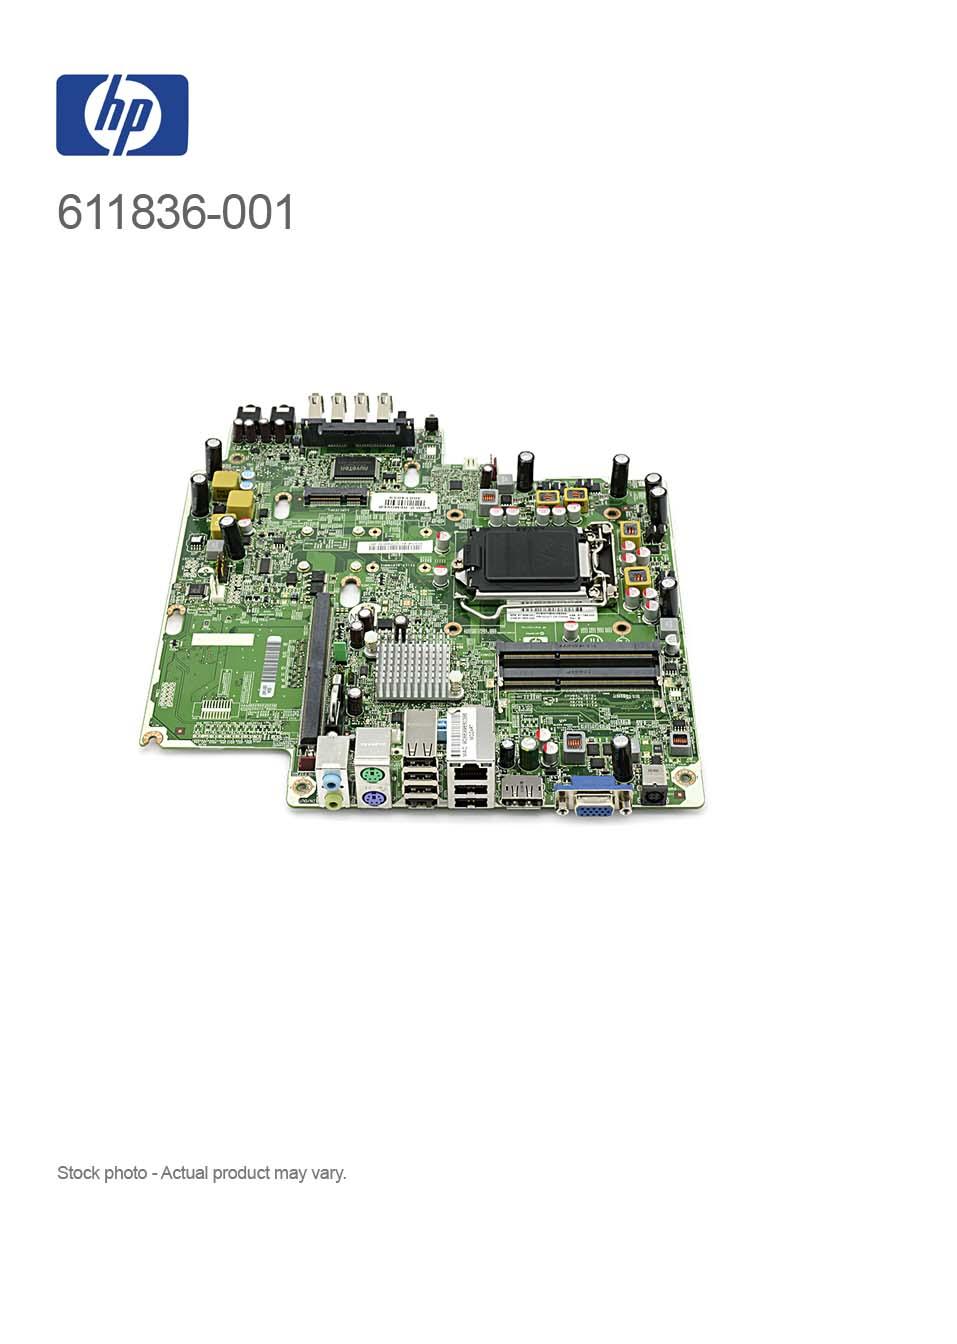 Hp 8200 Elite Motherboard Diagram : elite, motherboard, diagram, 611836-001, System, Board, Compaq, Elite, Ultraslim, CompuPoint